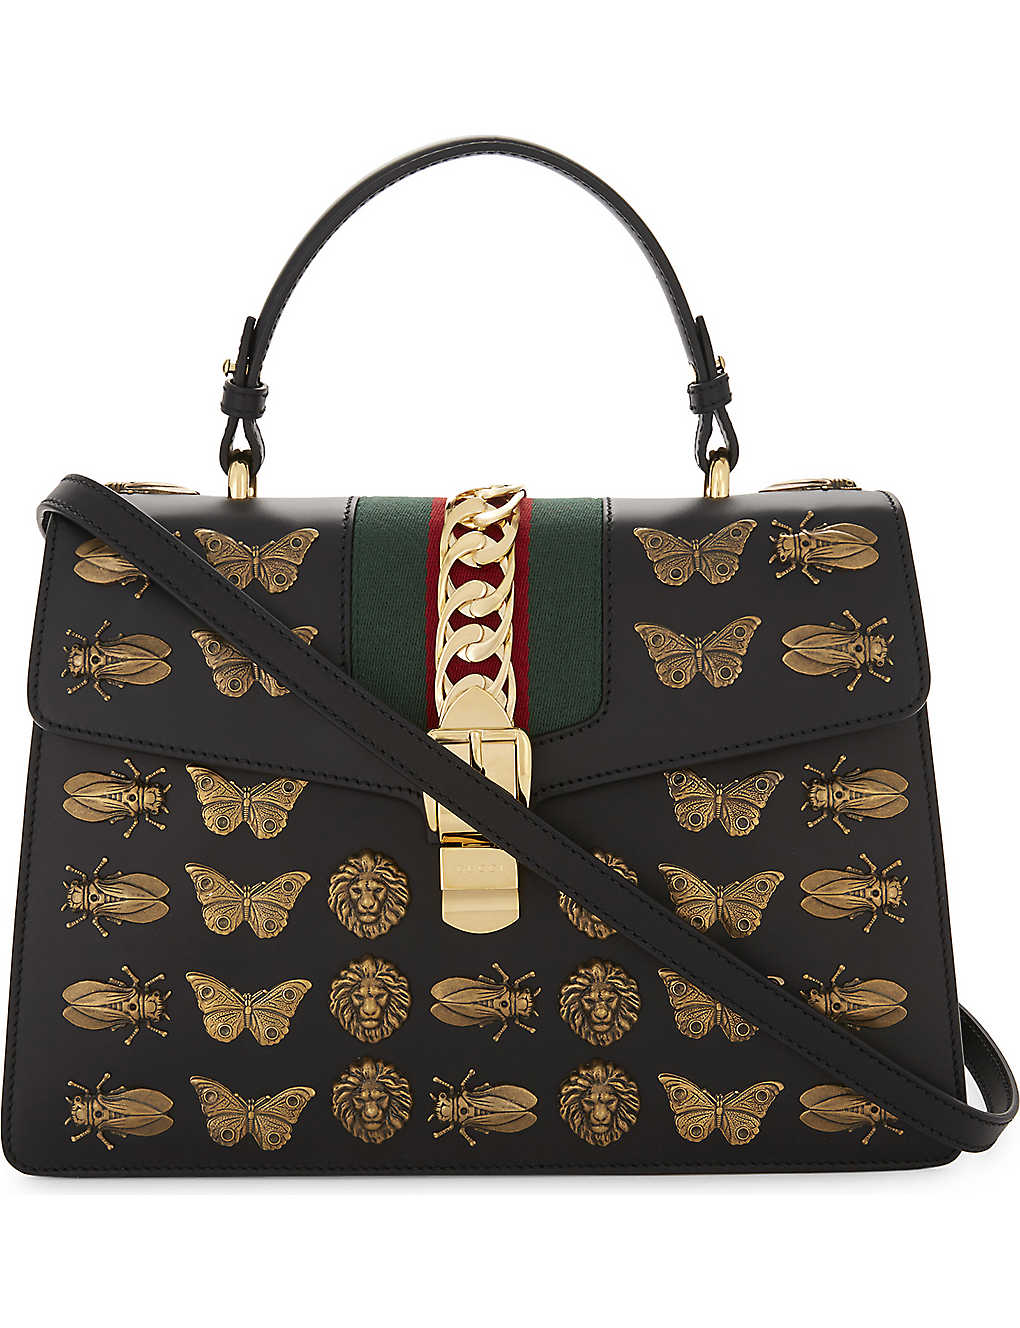 889ace24b GUCCI - Sylvie medium leather shoulder bag | Selfridges.com